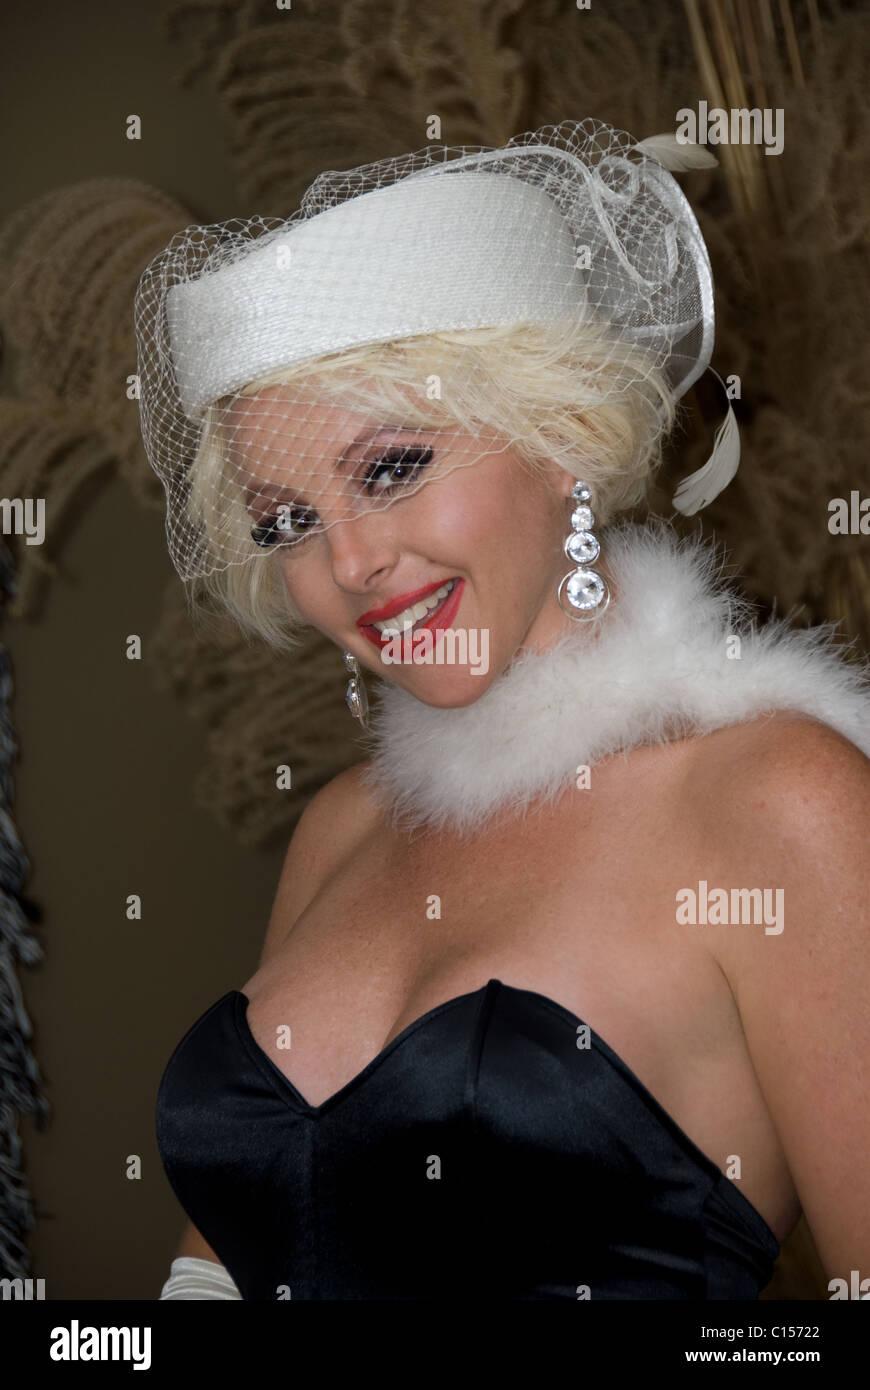 Amy as Marilyn Monroe - Stock Image